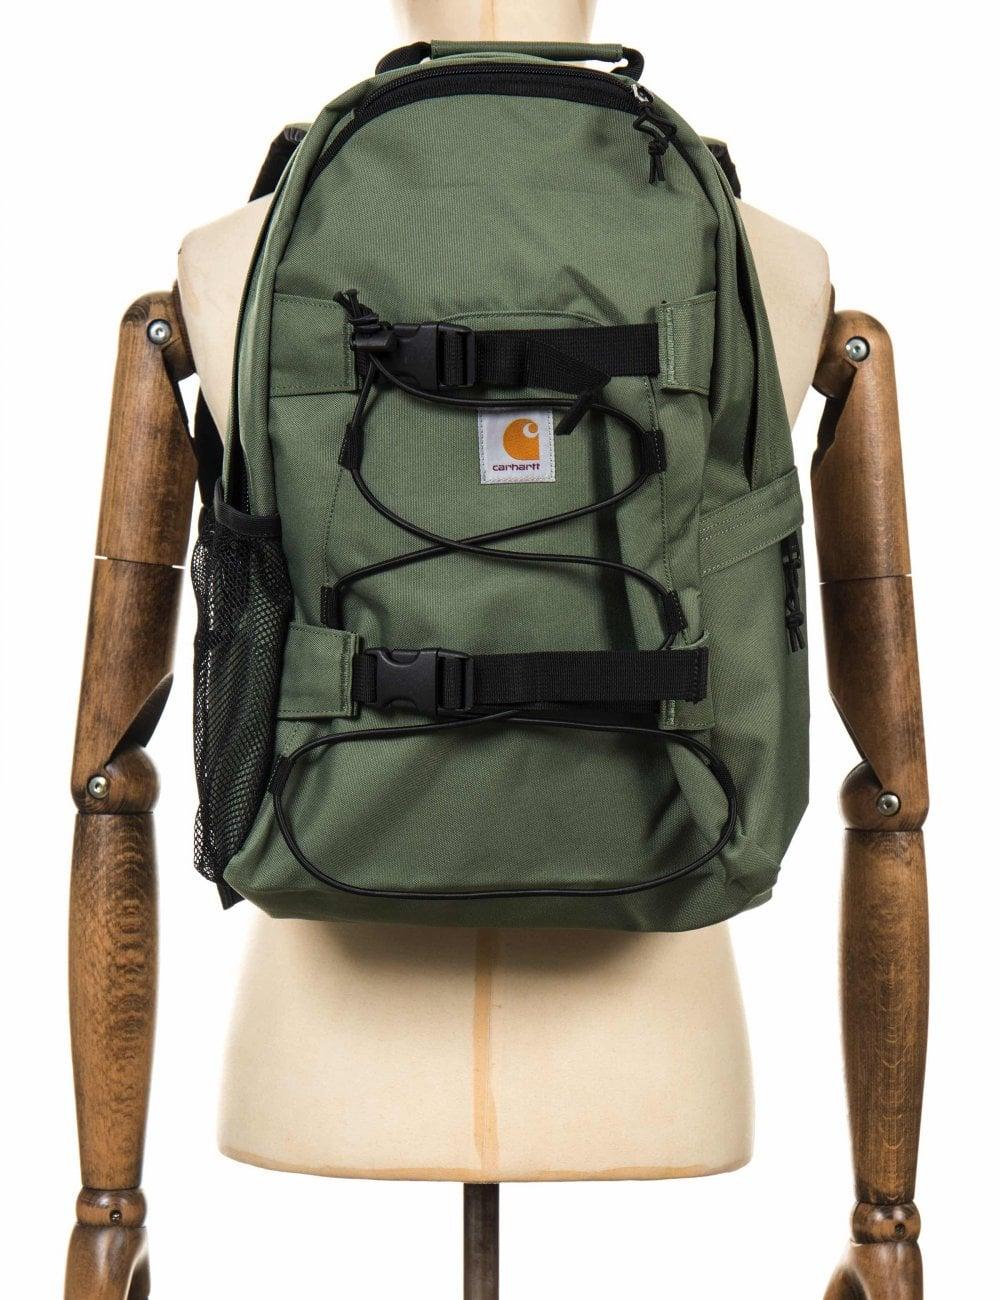 reasonable price good selling the best attitude Kickflip 25L Backpack - Adventure